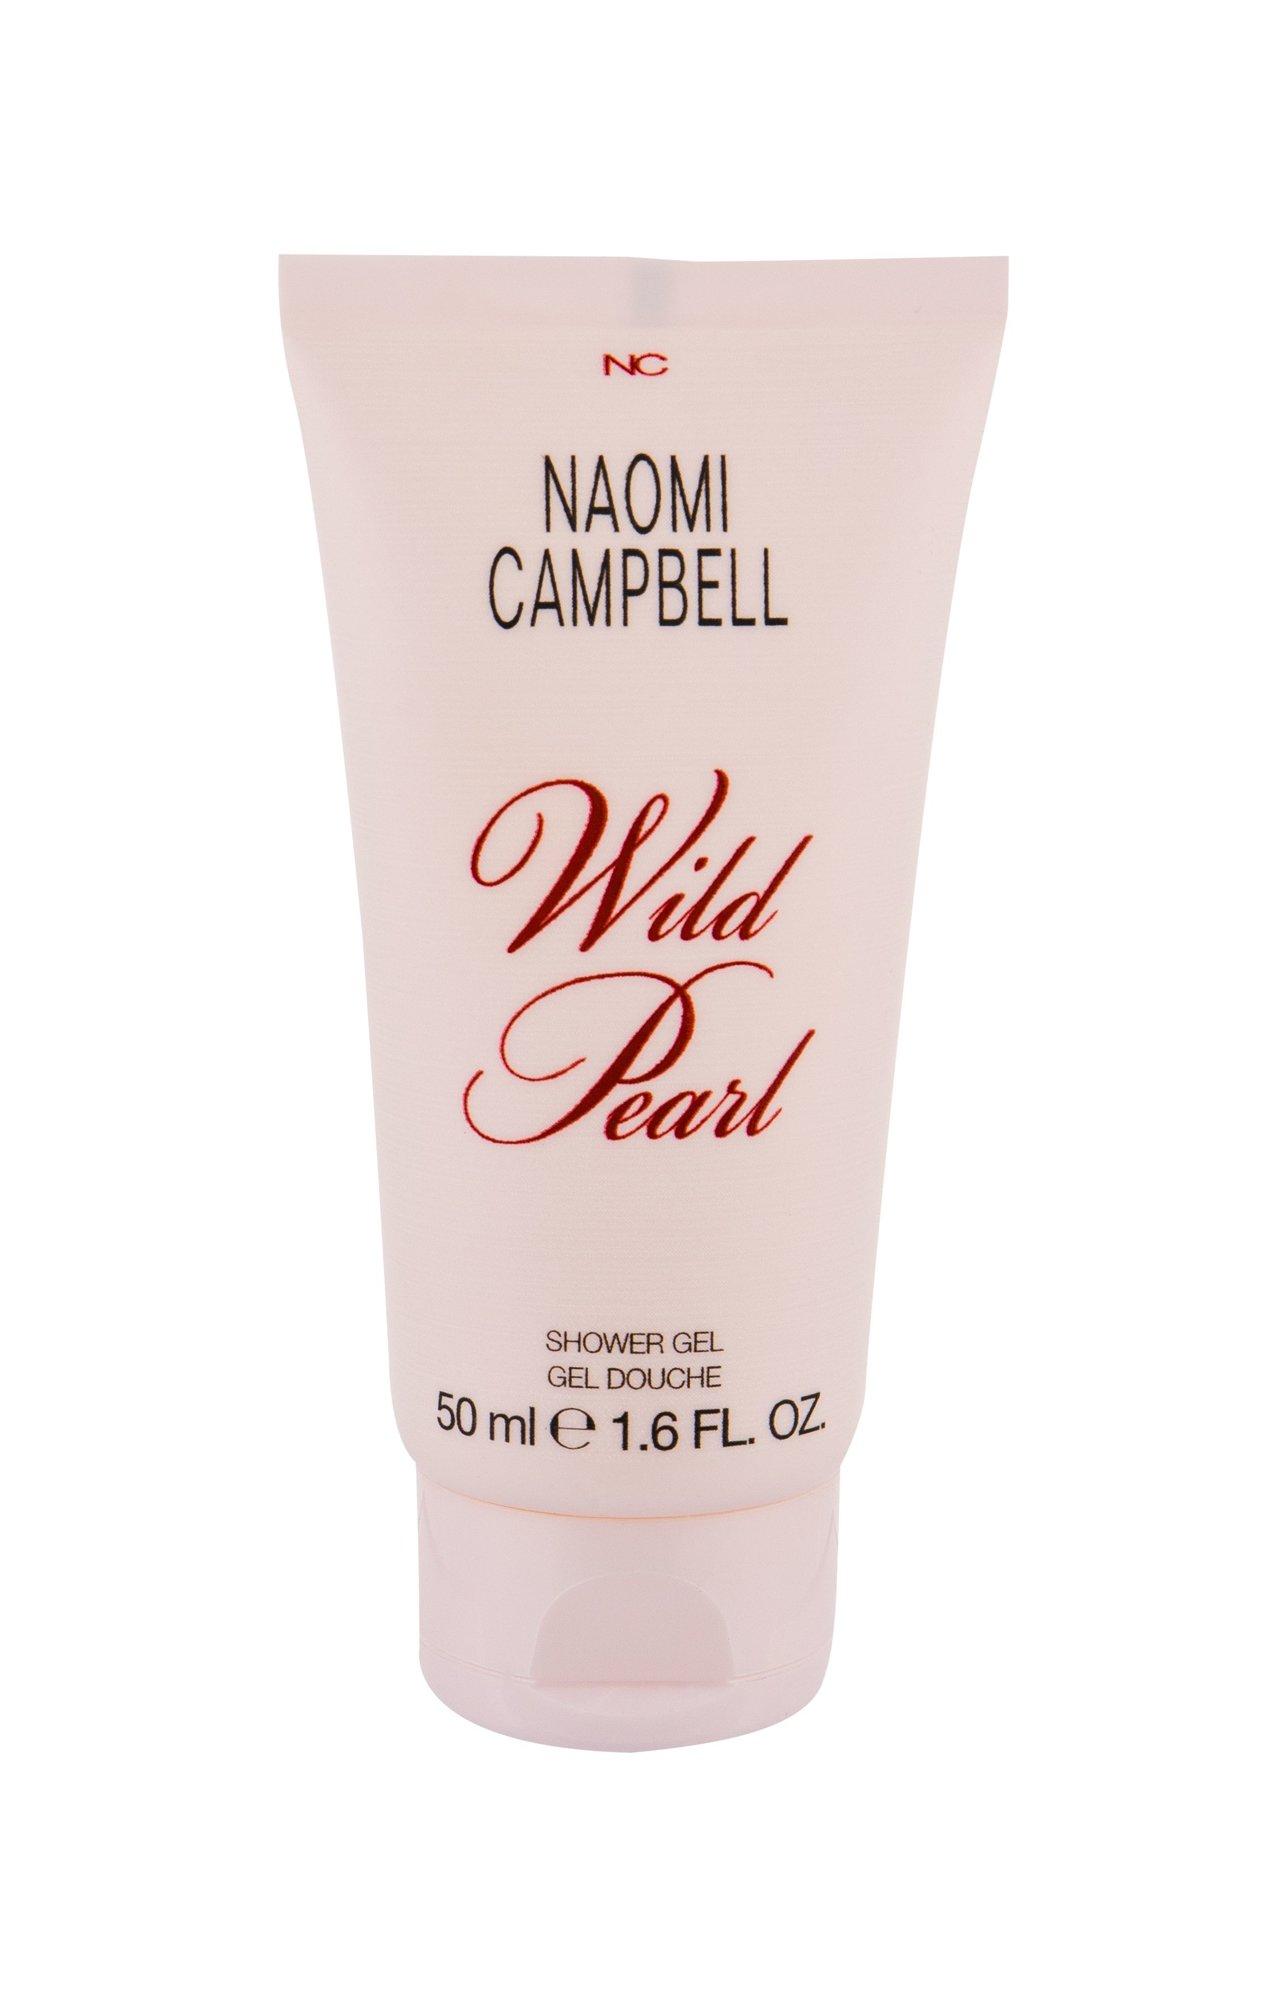 Naomi Campbell Wild Pearl Shower Gel 50ml